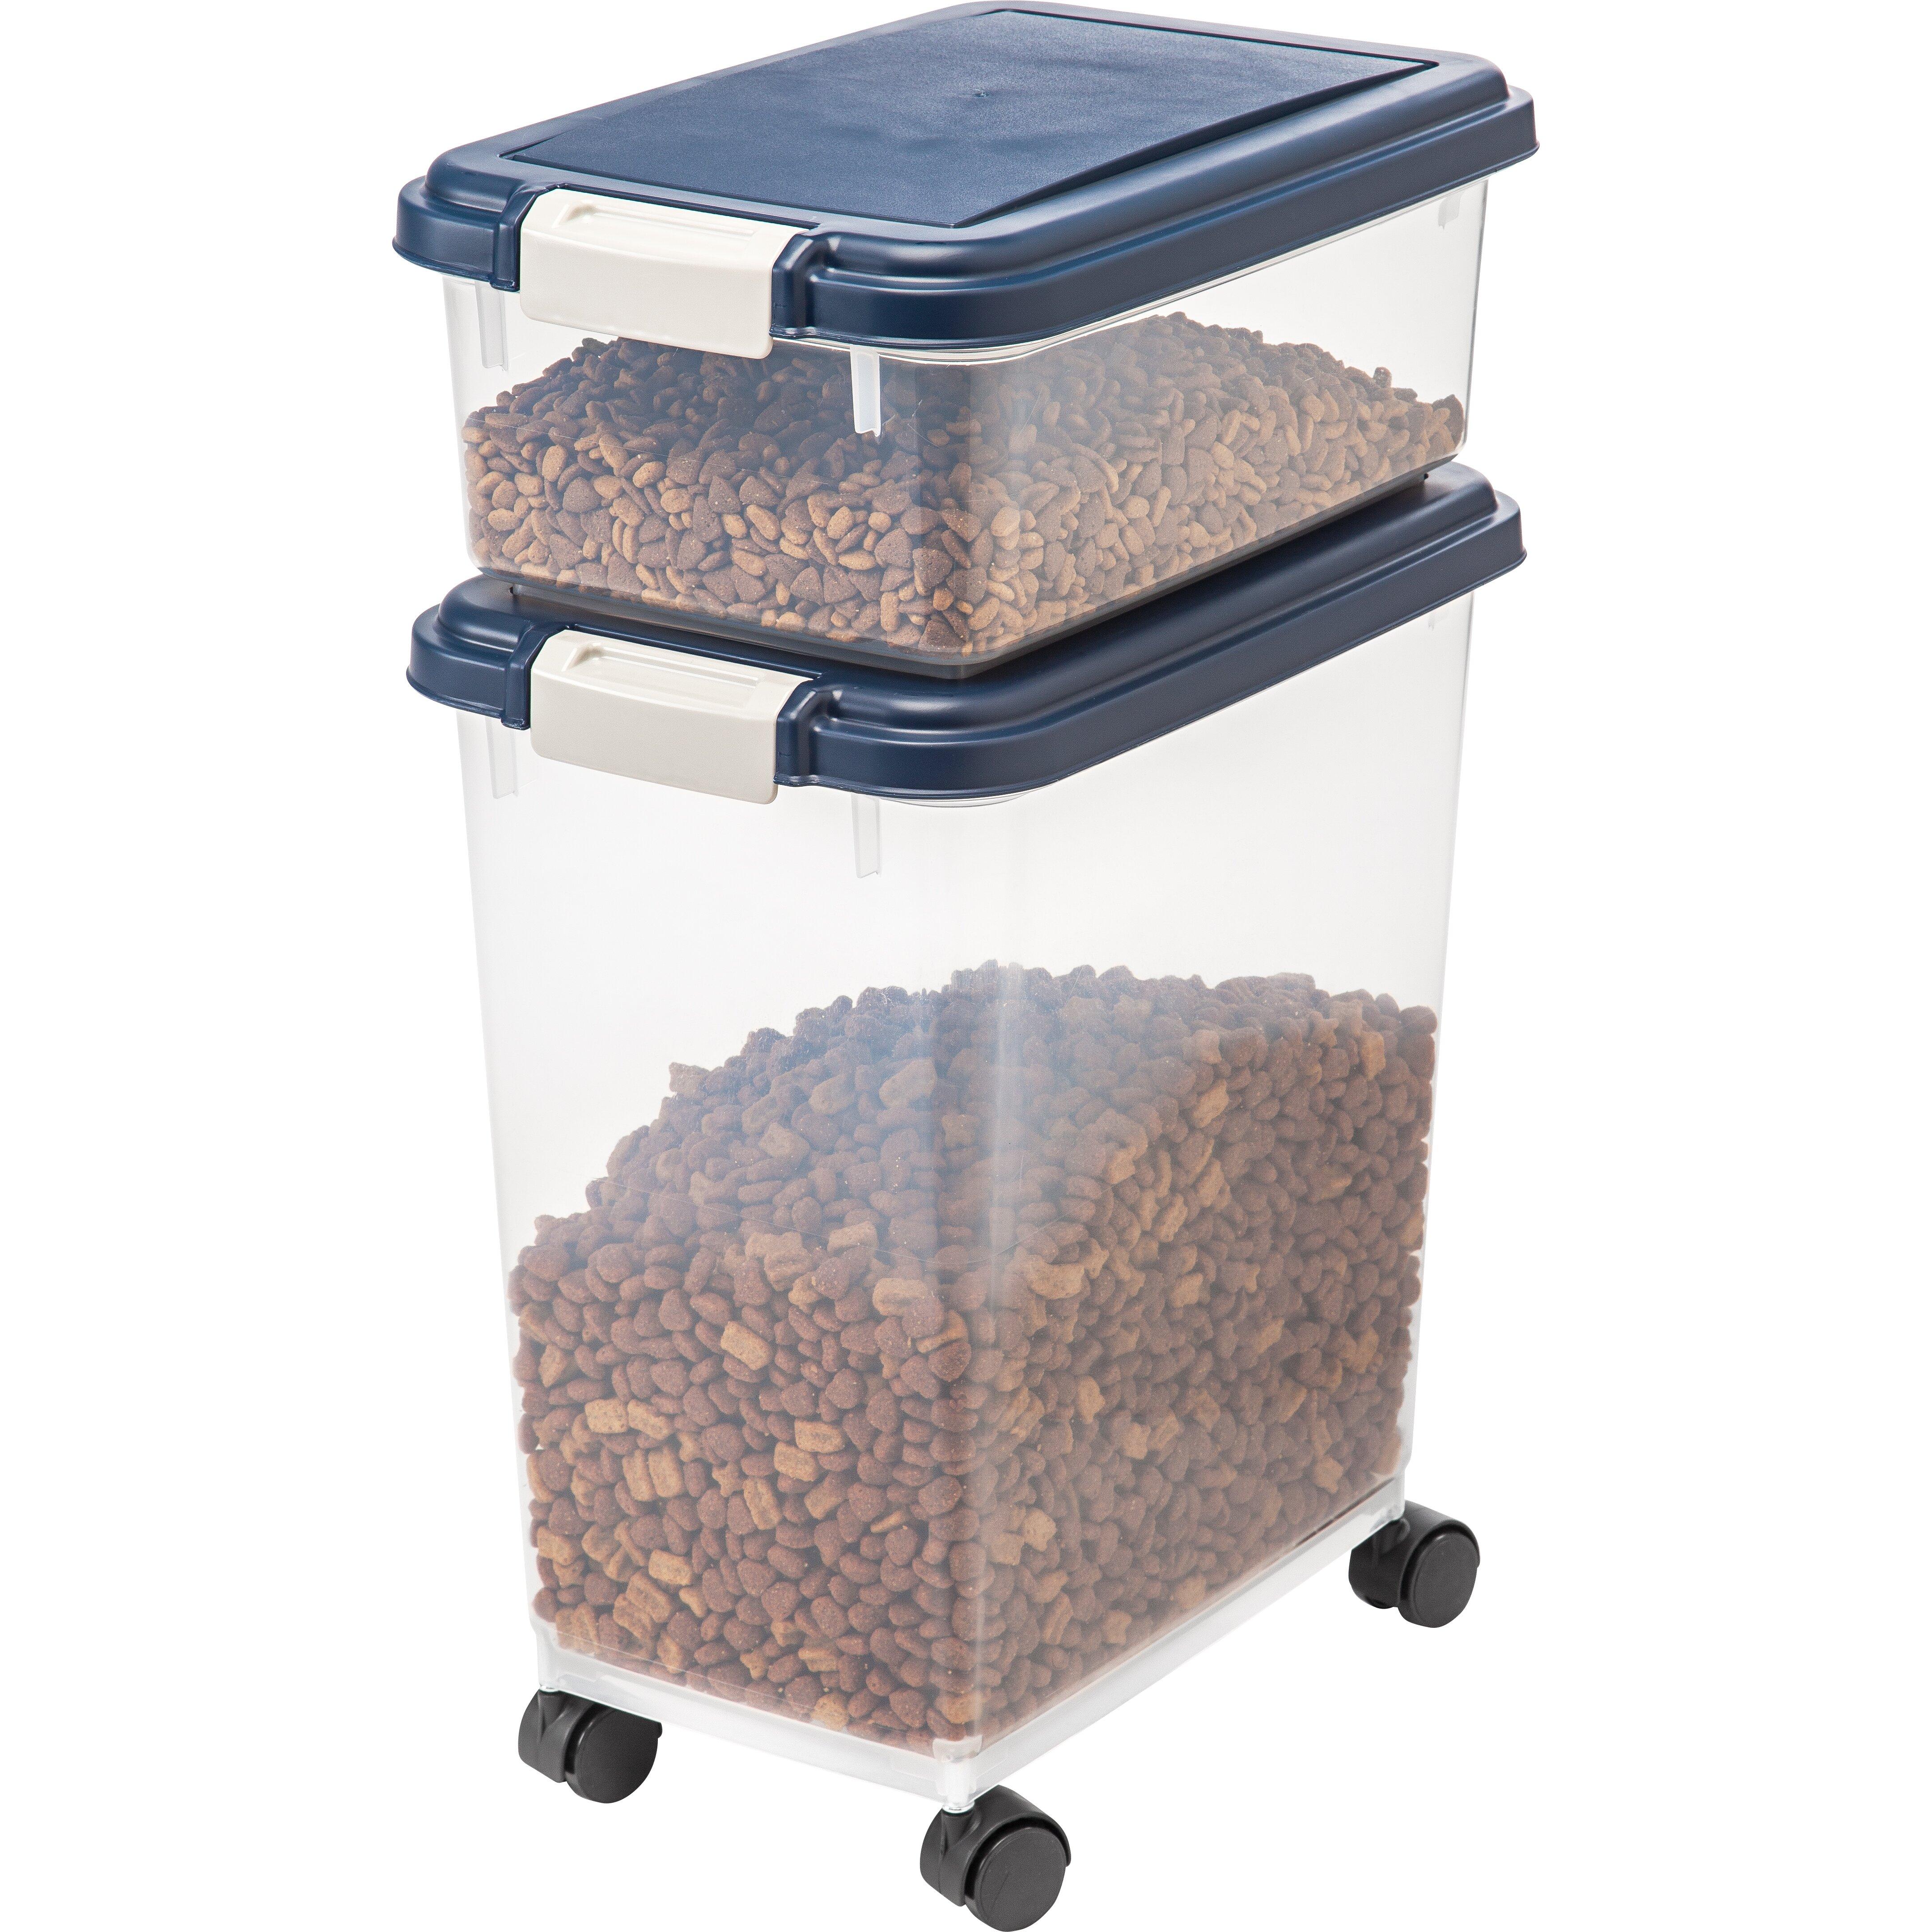 Iris 3 Piece Airtight Pet Food Storage Container Set